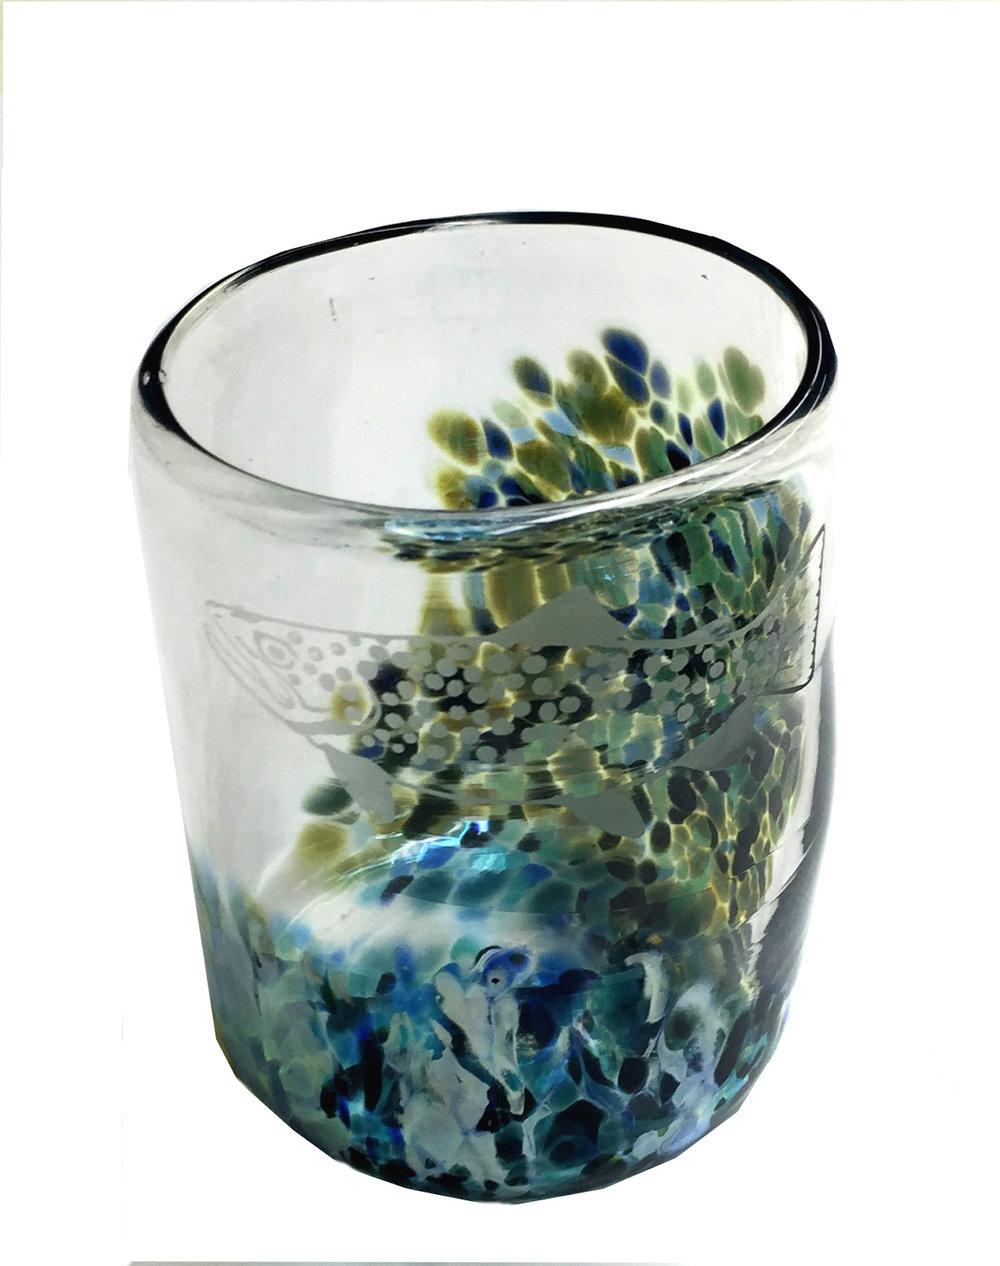 fishcup.JPG